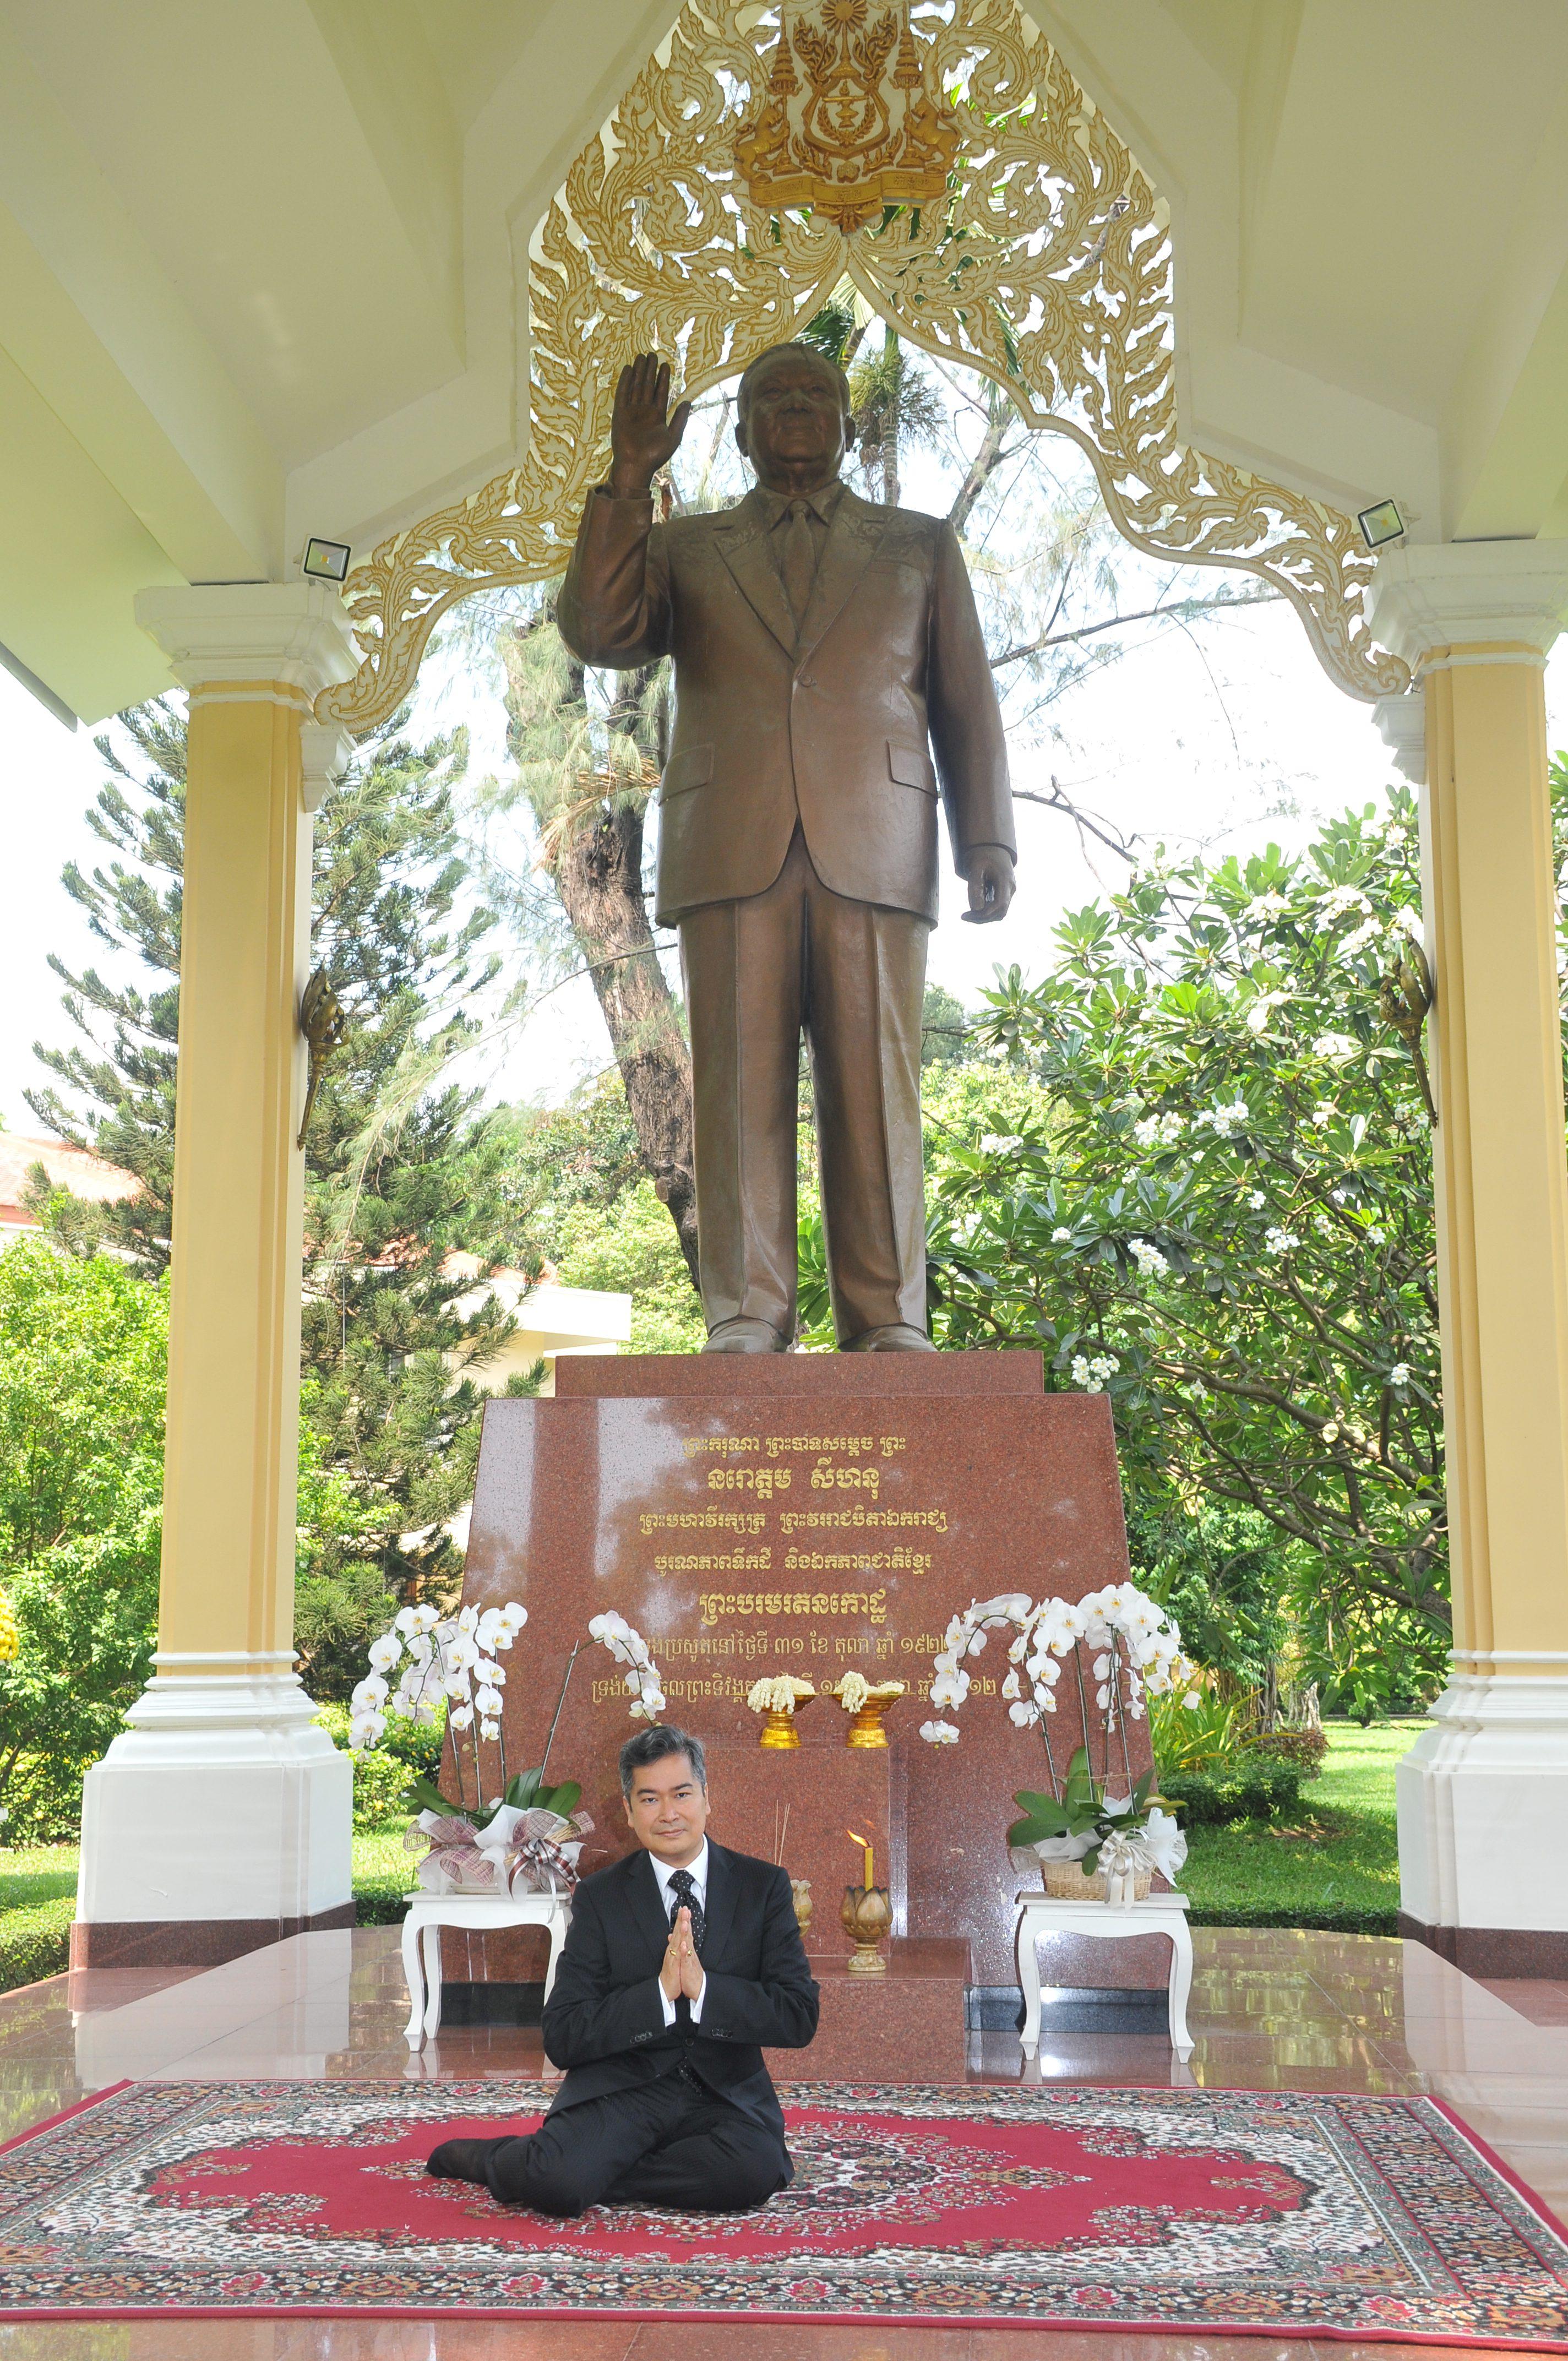 Sisowath Ravivaddhana Monipong